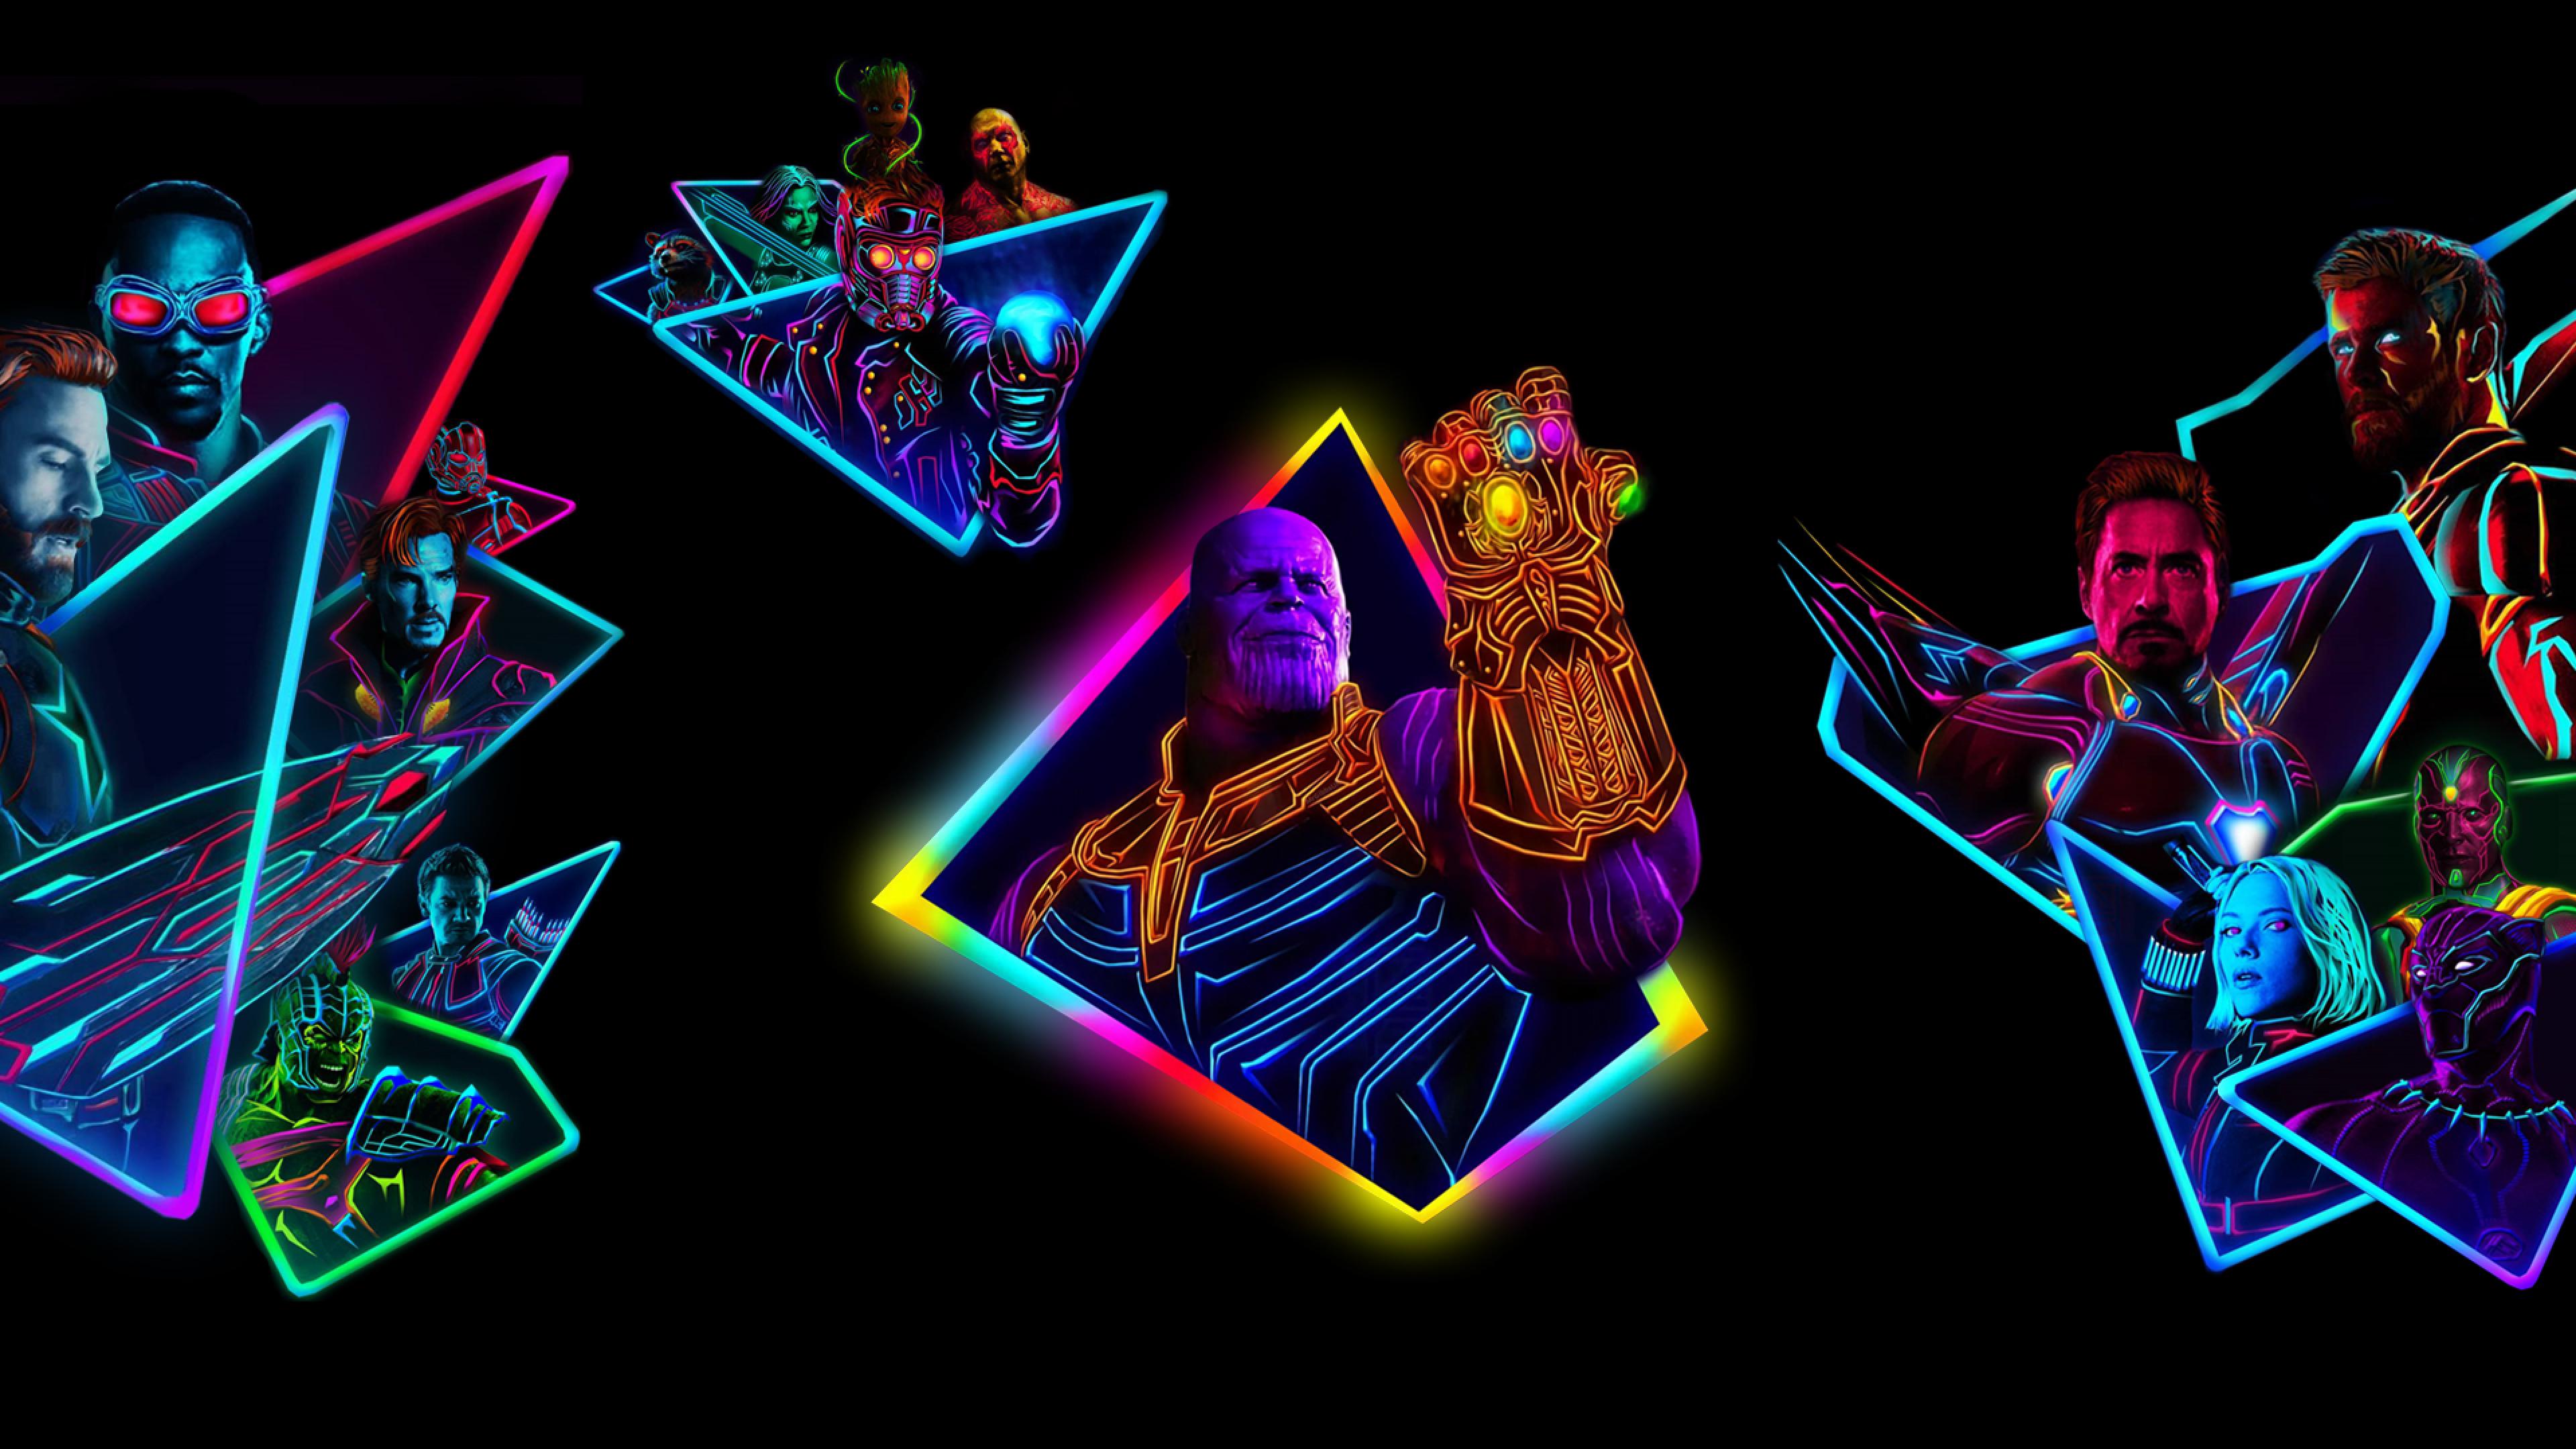 Avengers infinity war 80s neon style art full hd wallpaper - Neon hd wallpaper for mobile ...